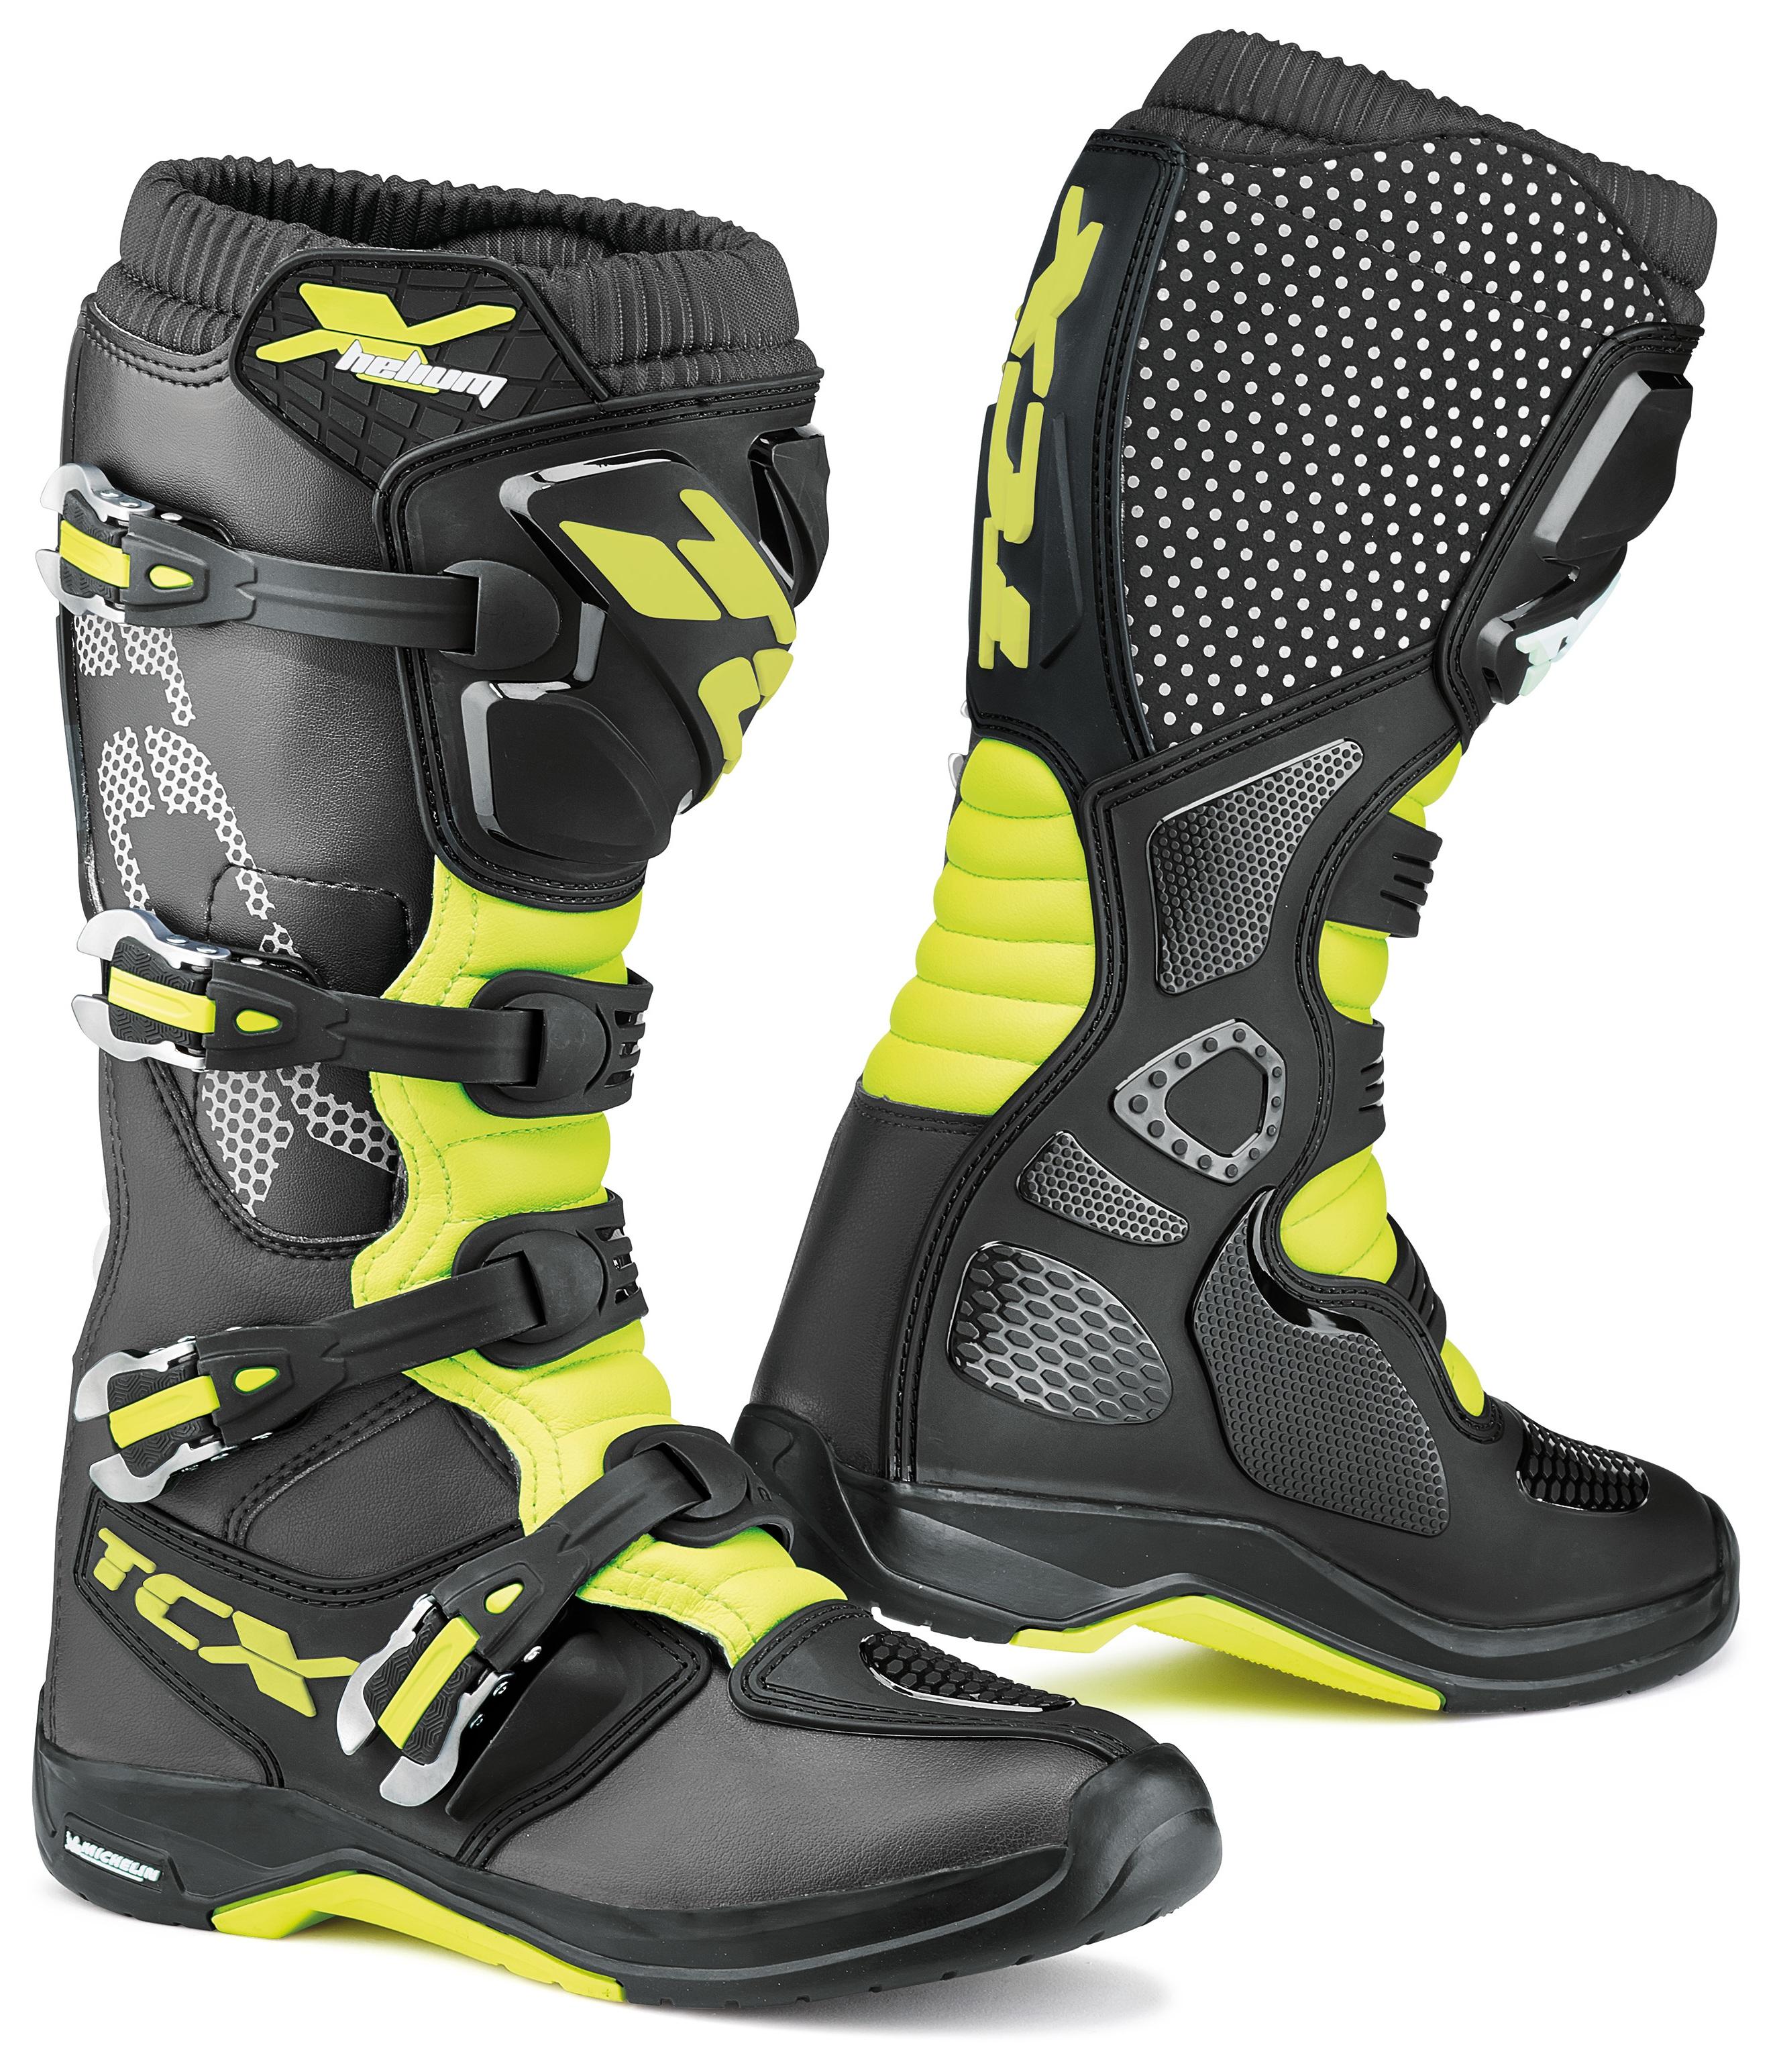 b1169b23bd42e0 TCX X-Helium Michelin Boots - Closeout